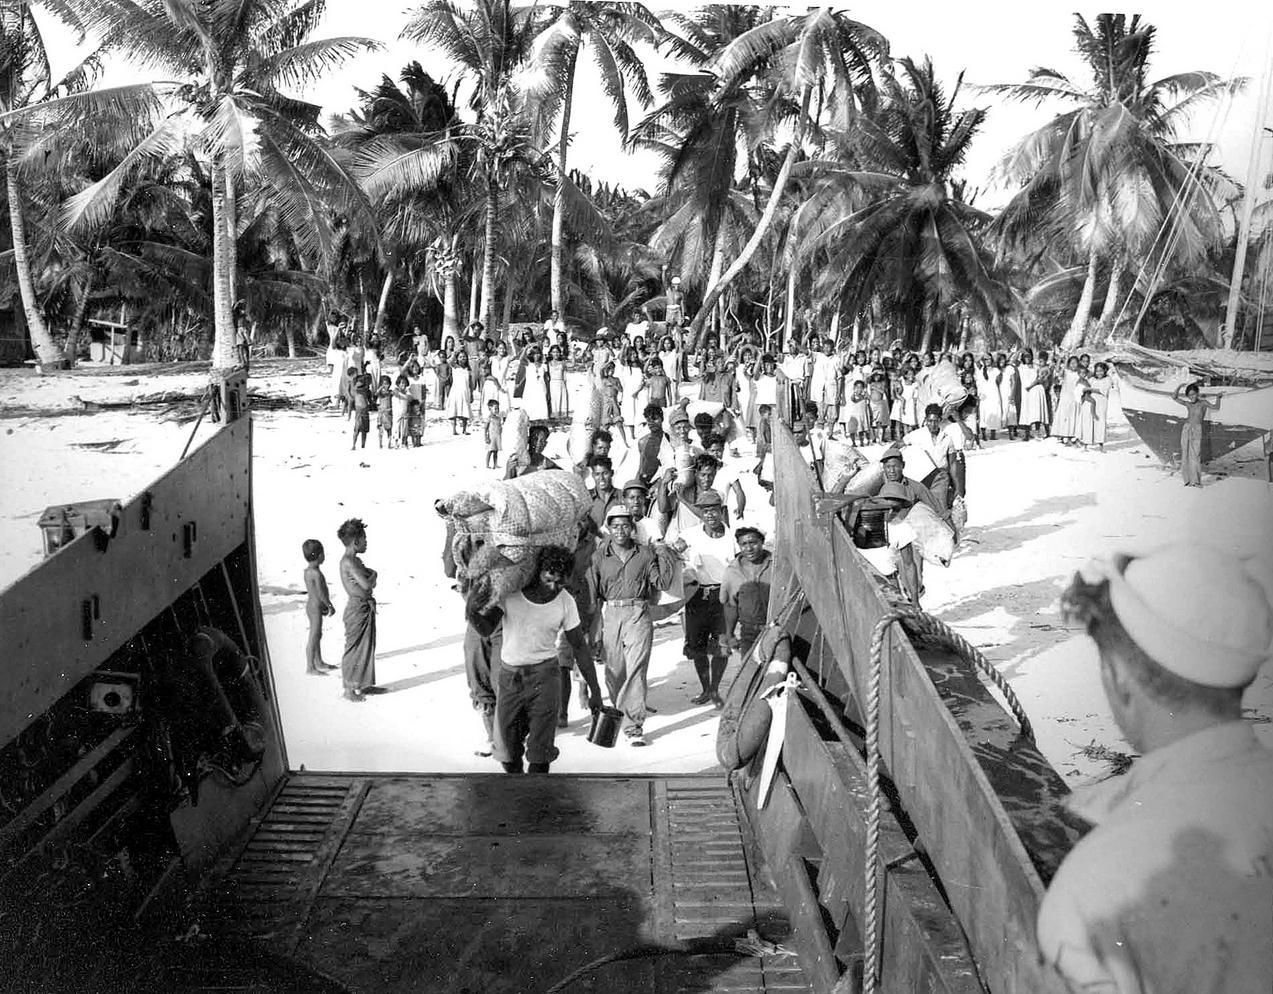 Evacuation of Bikini Atoll, 1946